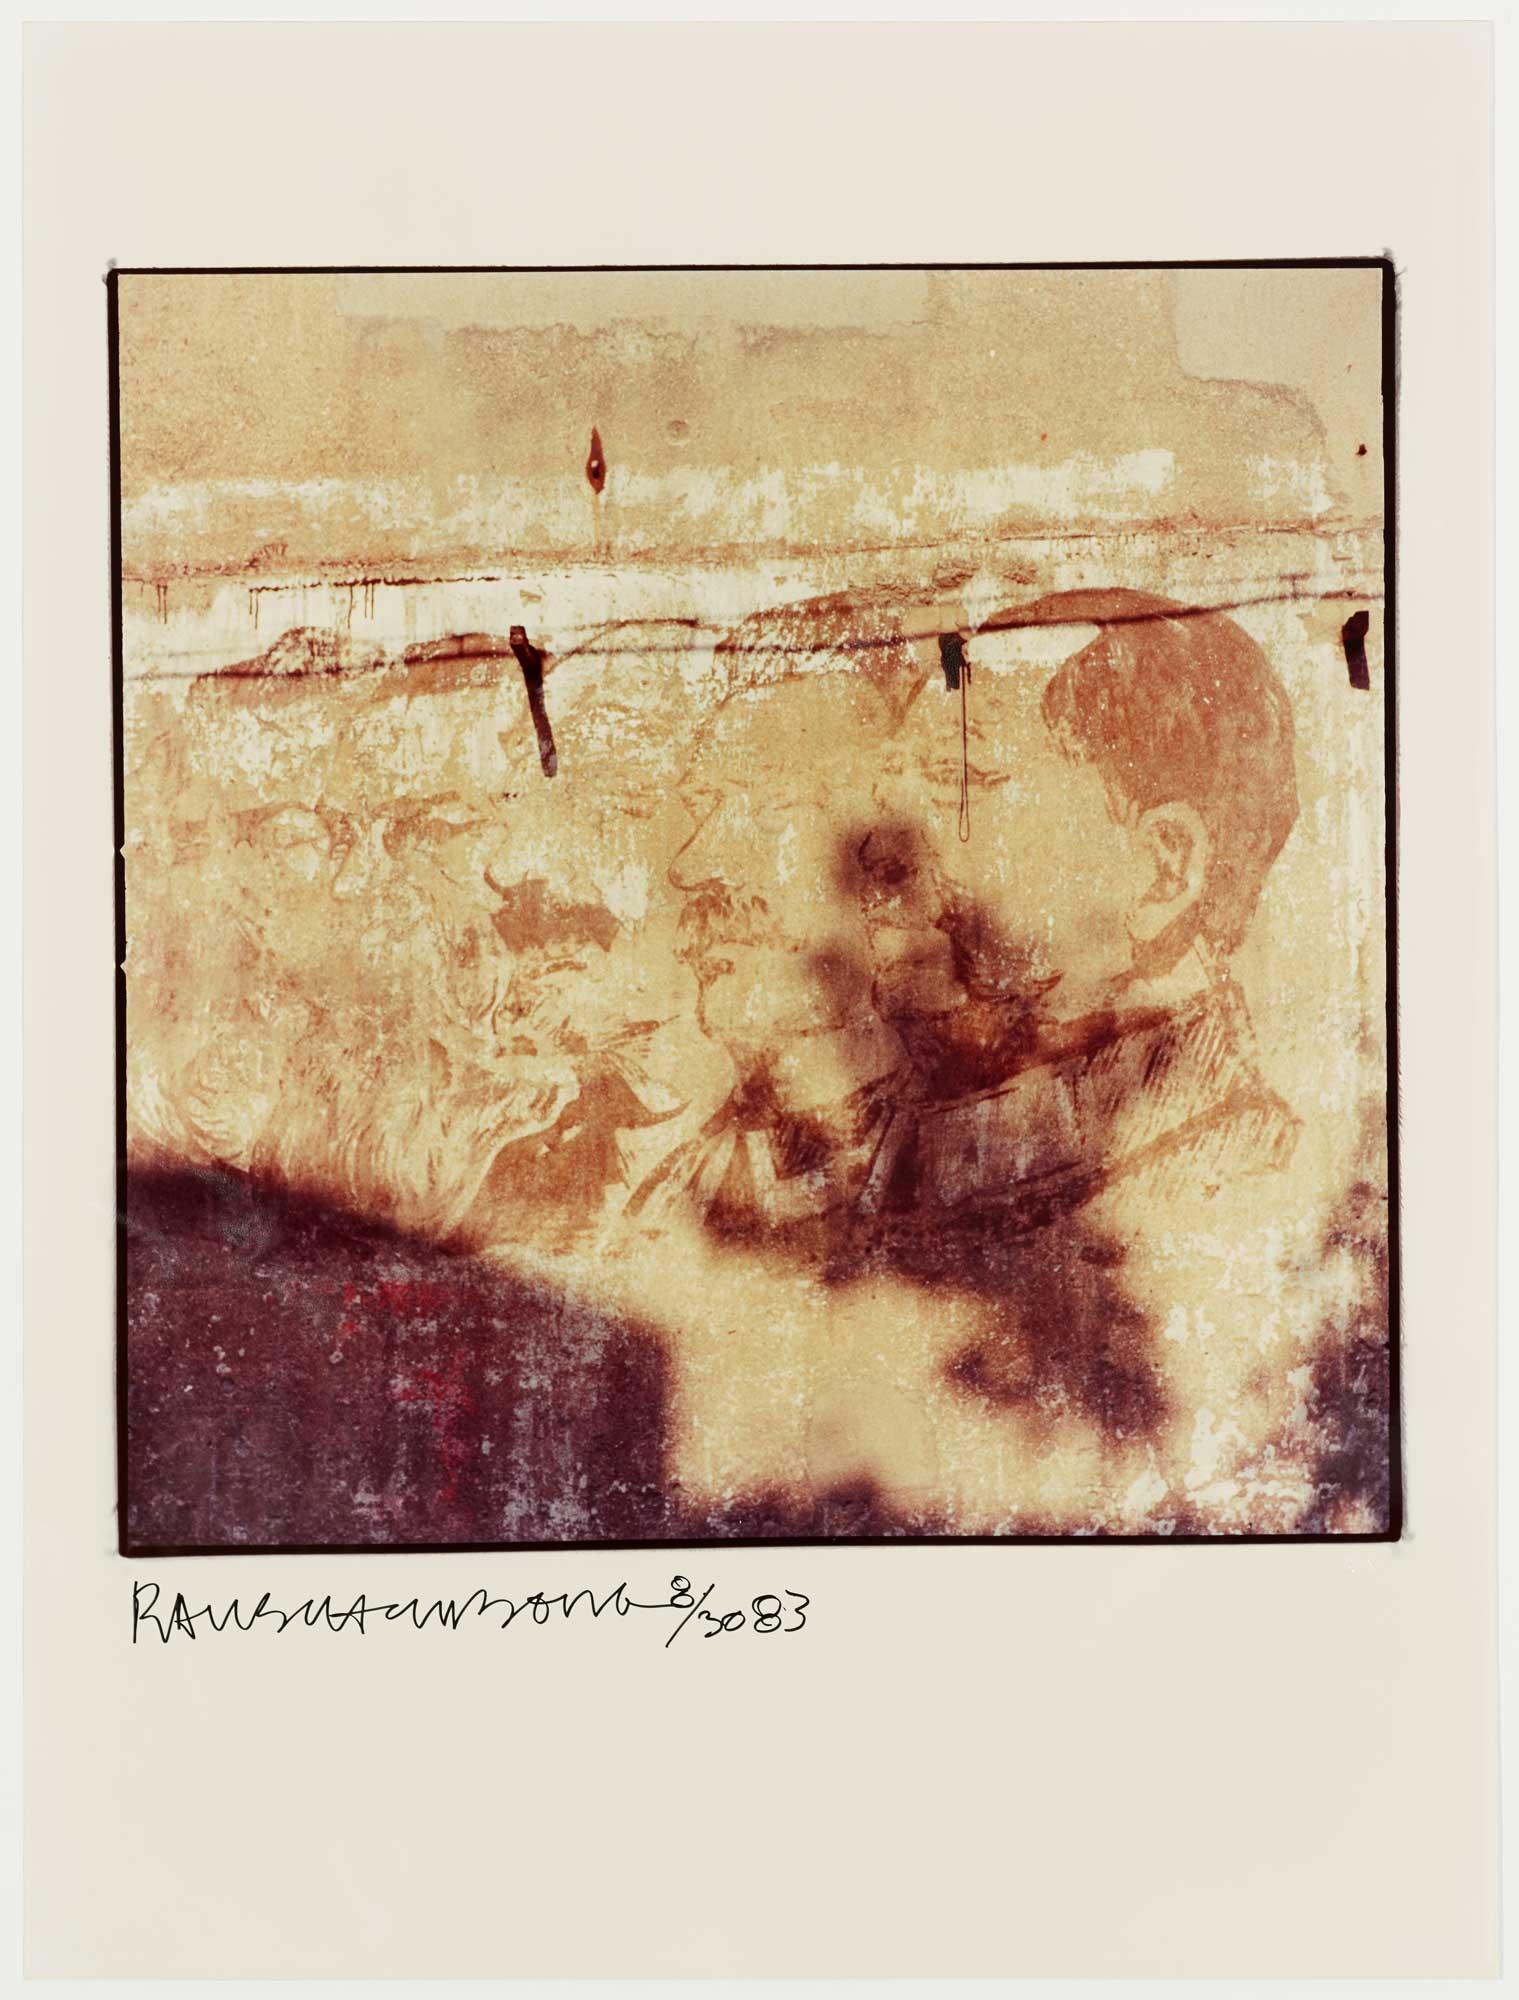 Profiles On Wall by Robert Rauschenberg